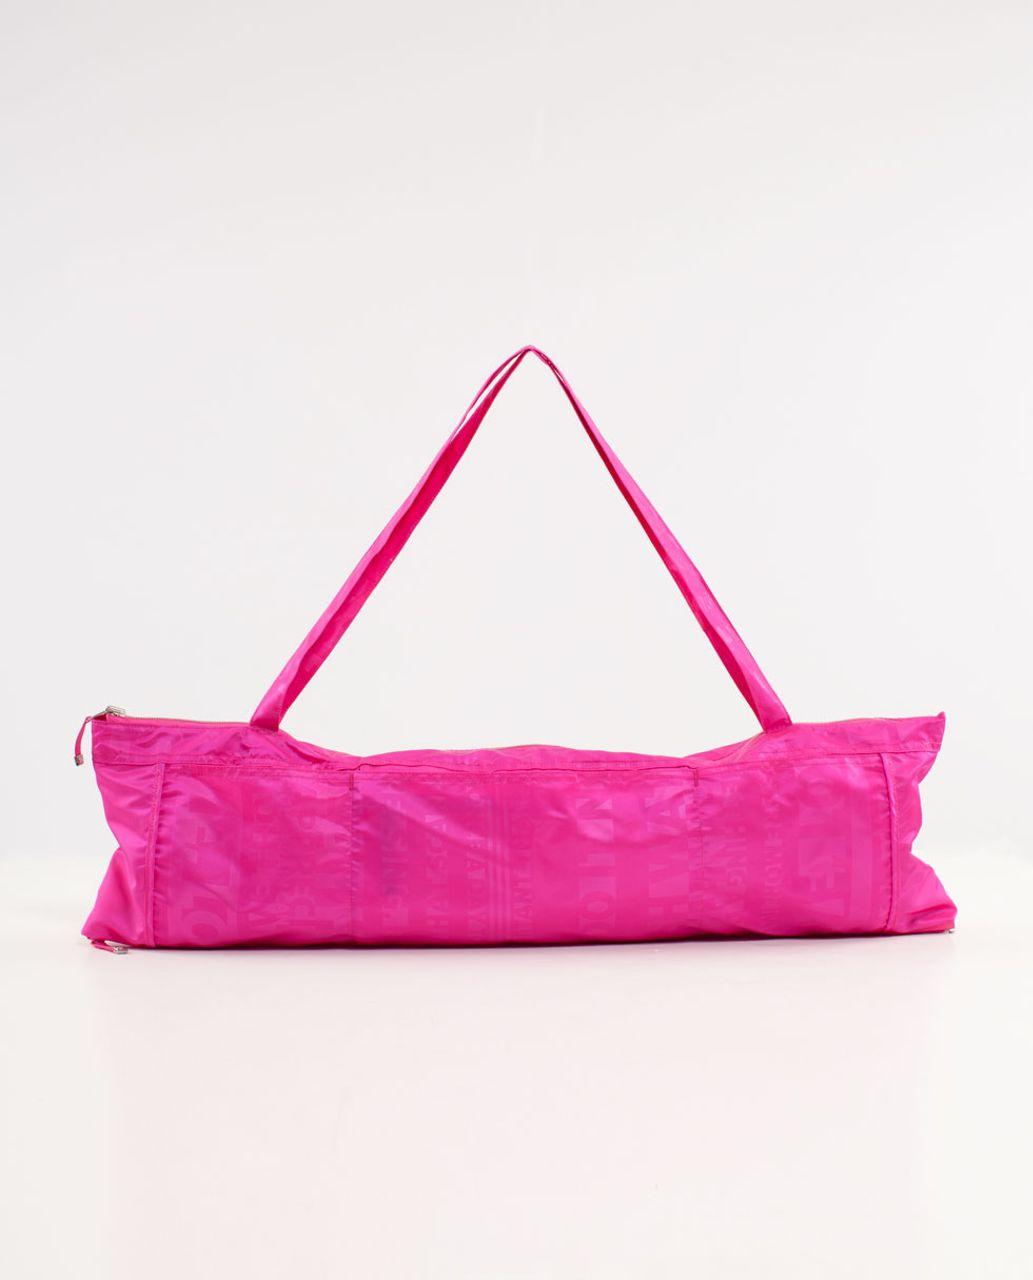 Lululemon Yogi Tote III - Discover Manifesto Embossed Paris Pink